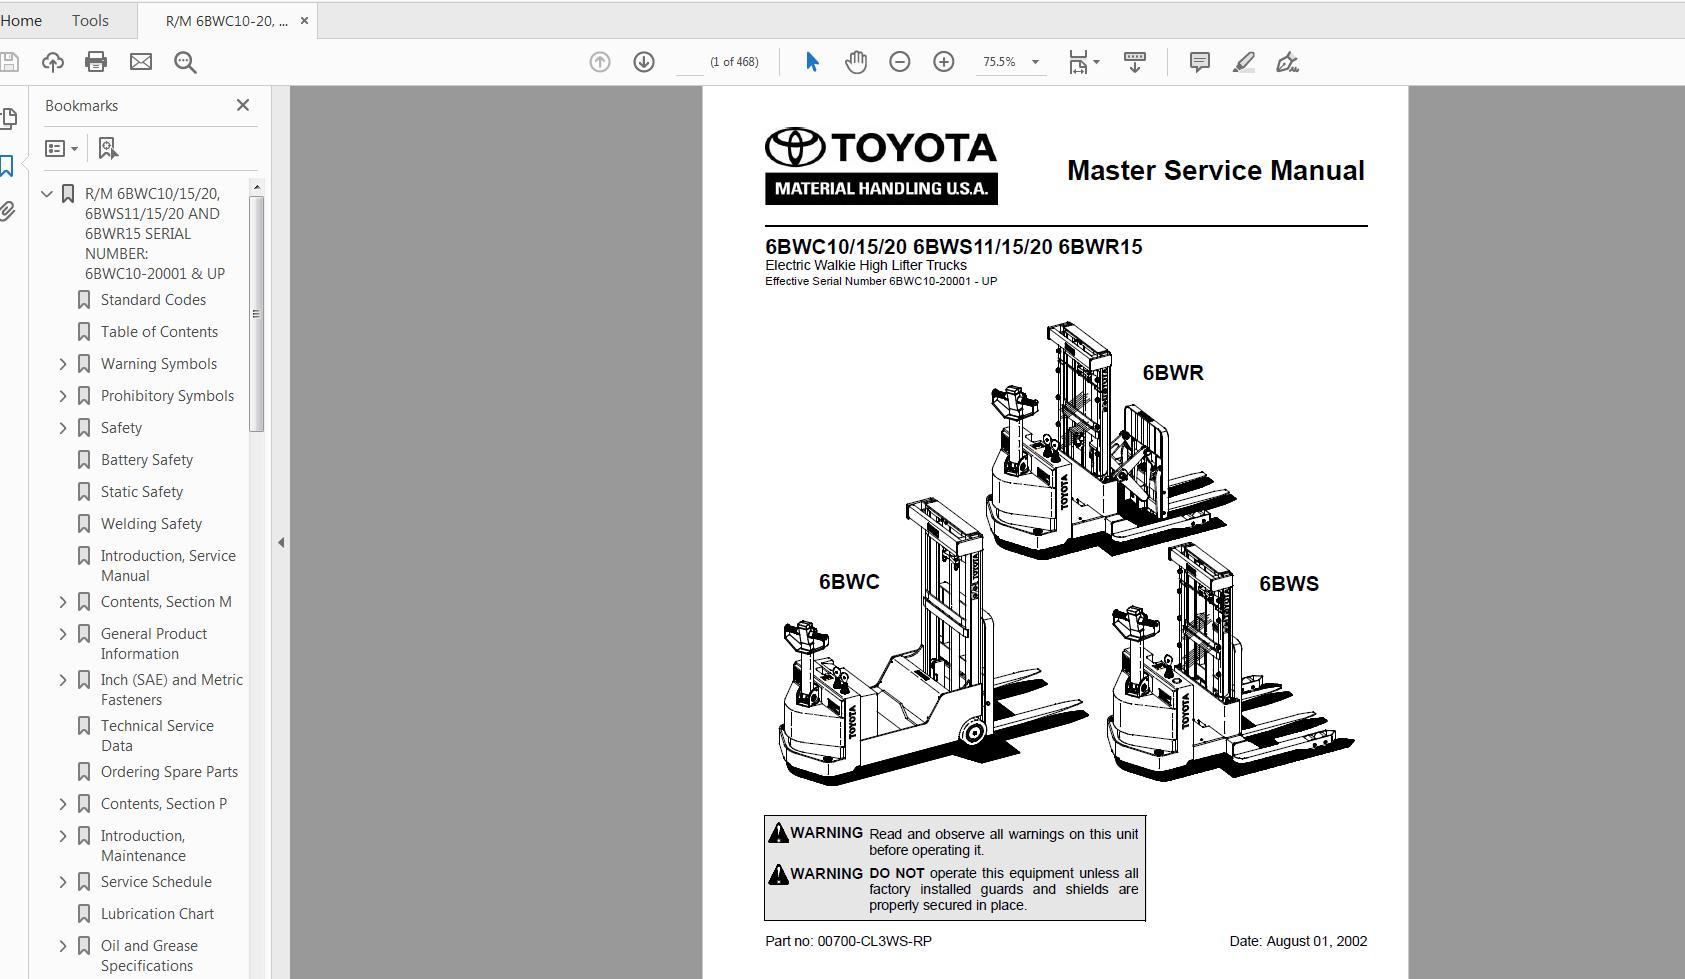 Toyota Forklift 6bwc10 15 20  6bws11 15 20  6bwr15 Master